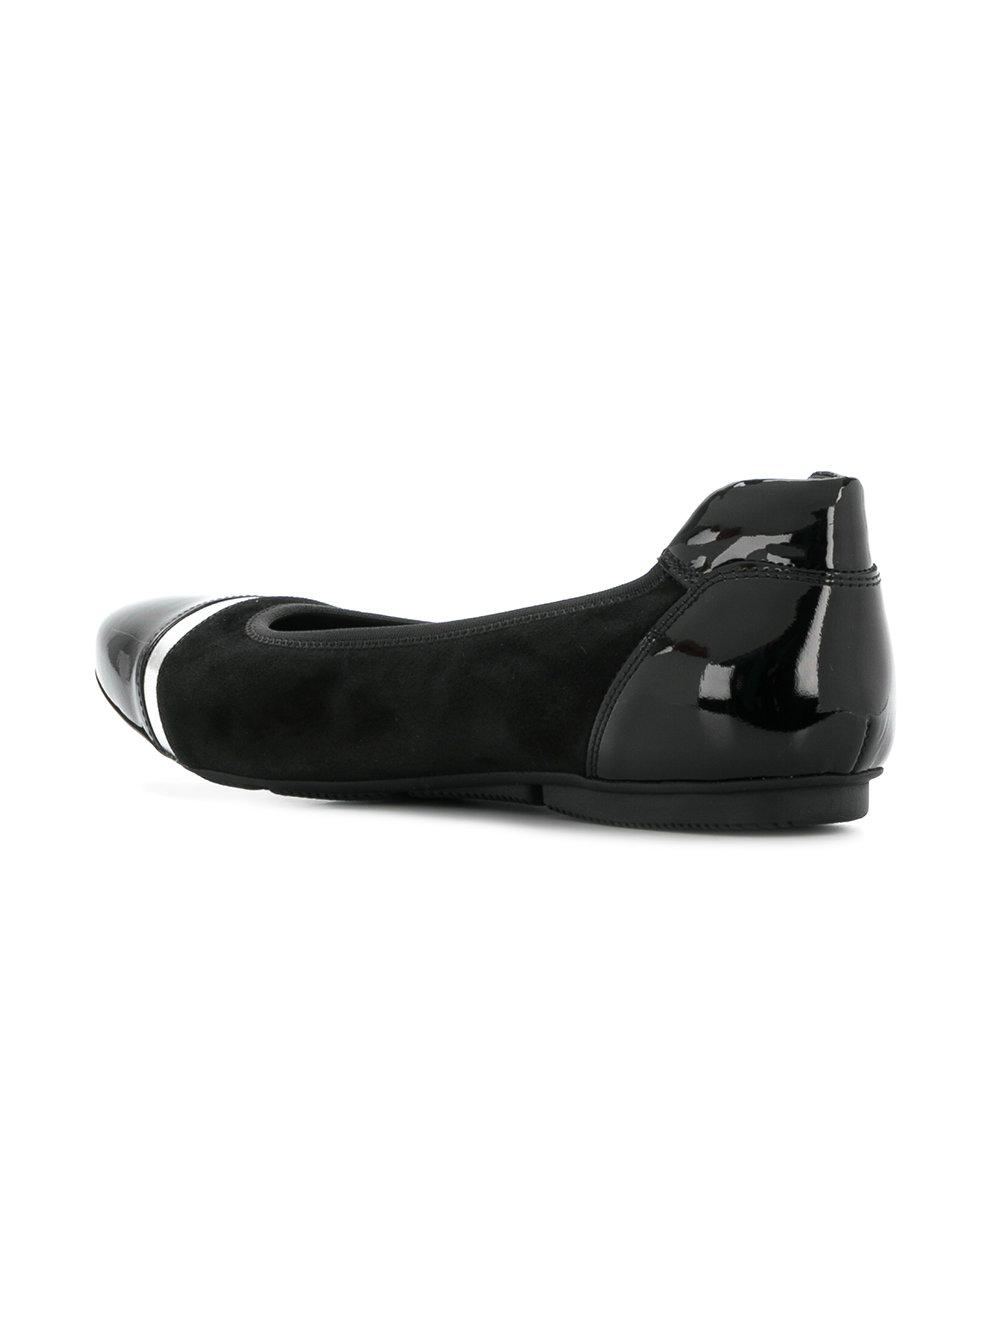 Hogan 'Wrap' ballerina shoes outlet shopping online b97Qa